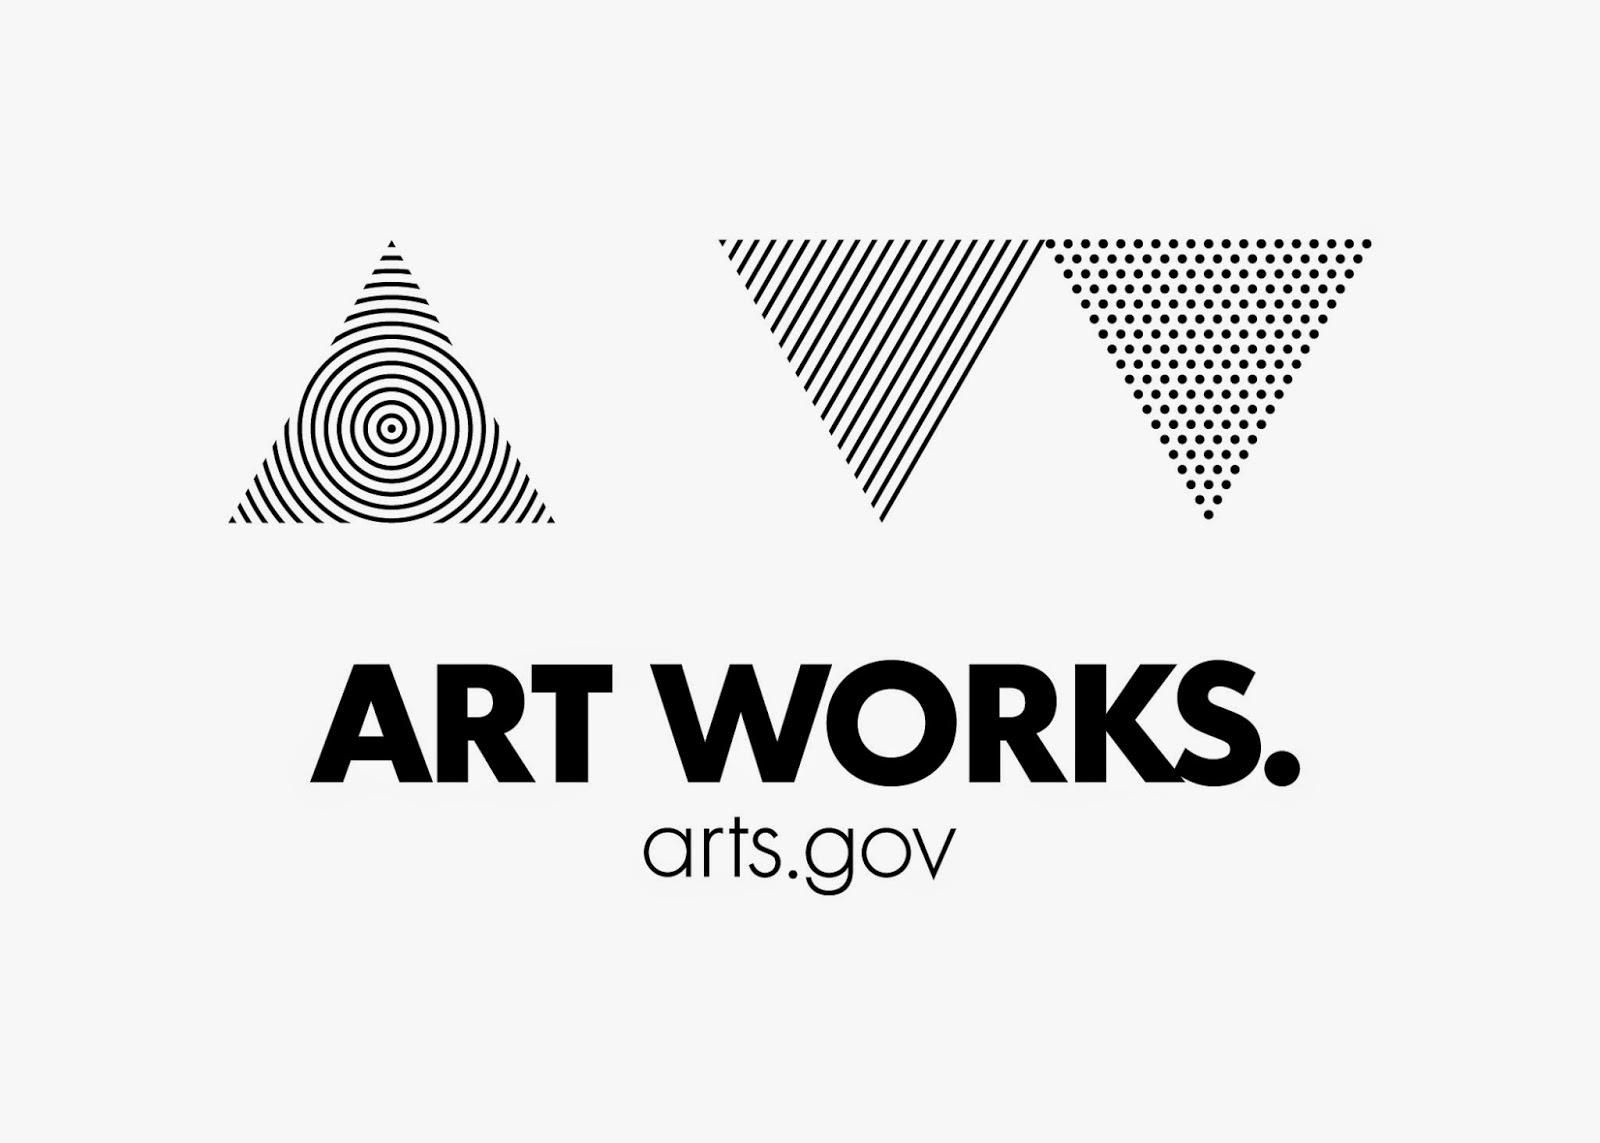 http://arts.gov/